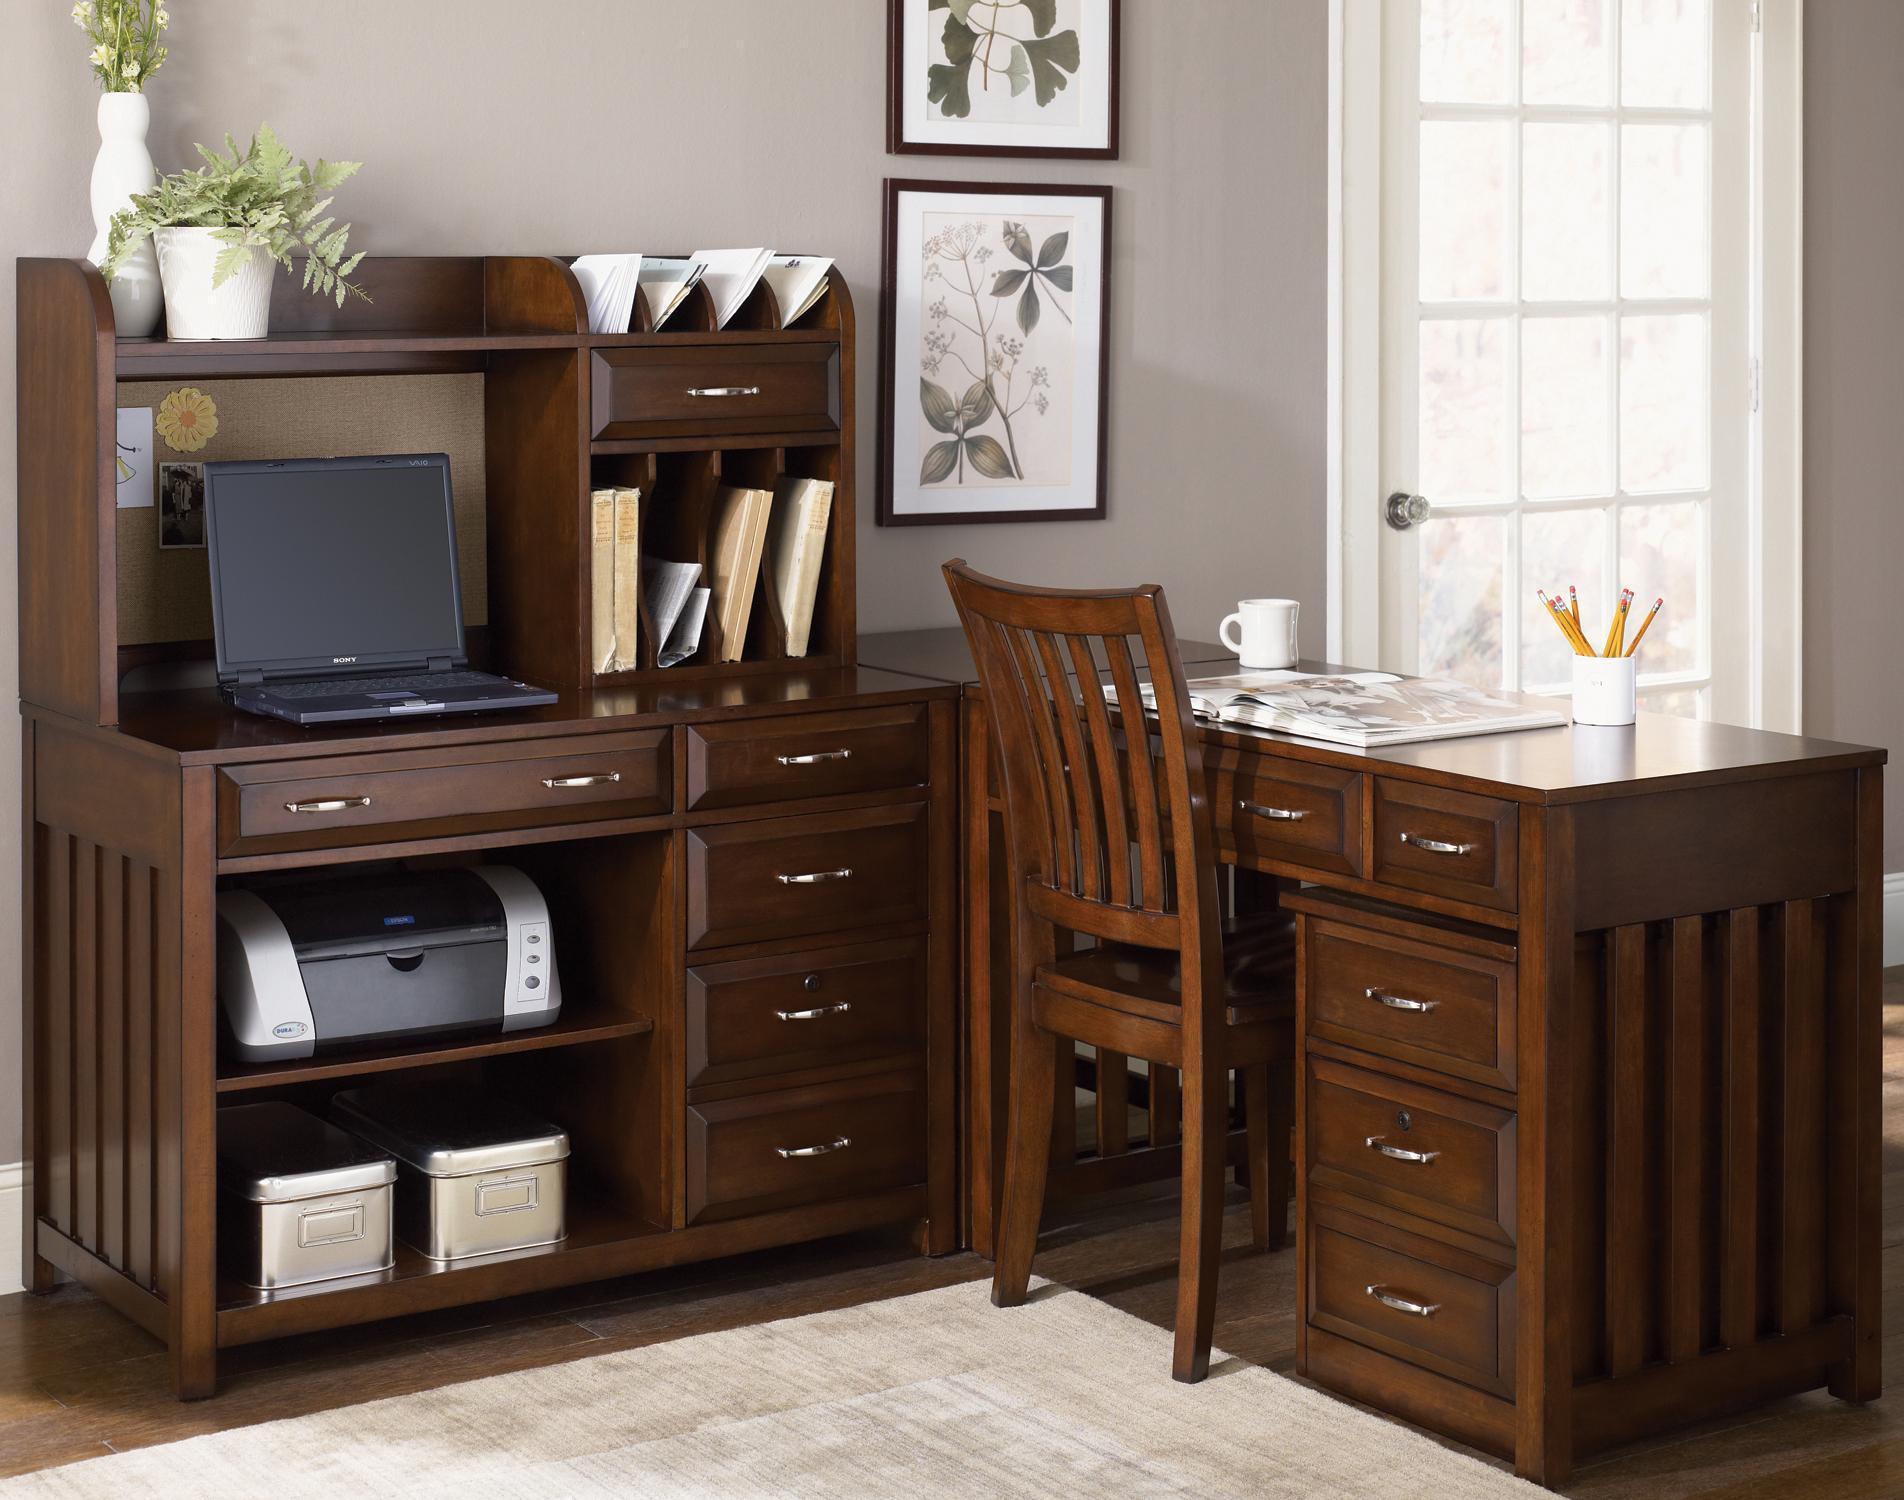 5 Piece L-Shaped Desk and File Cabinet Unit